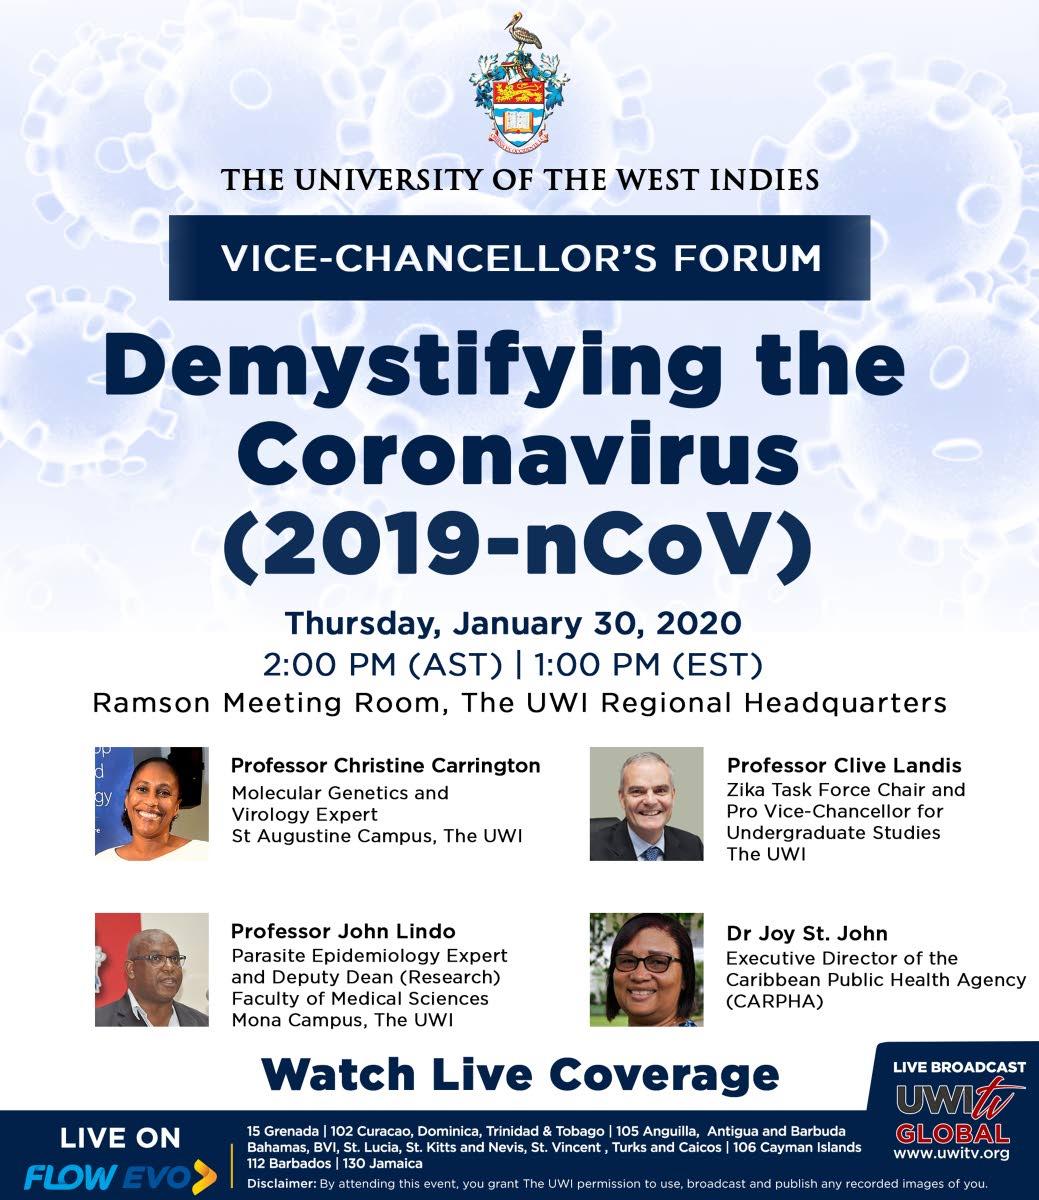 UWI hosts forum today on coronavirus (2019-nCoV)